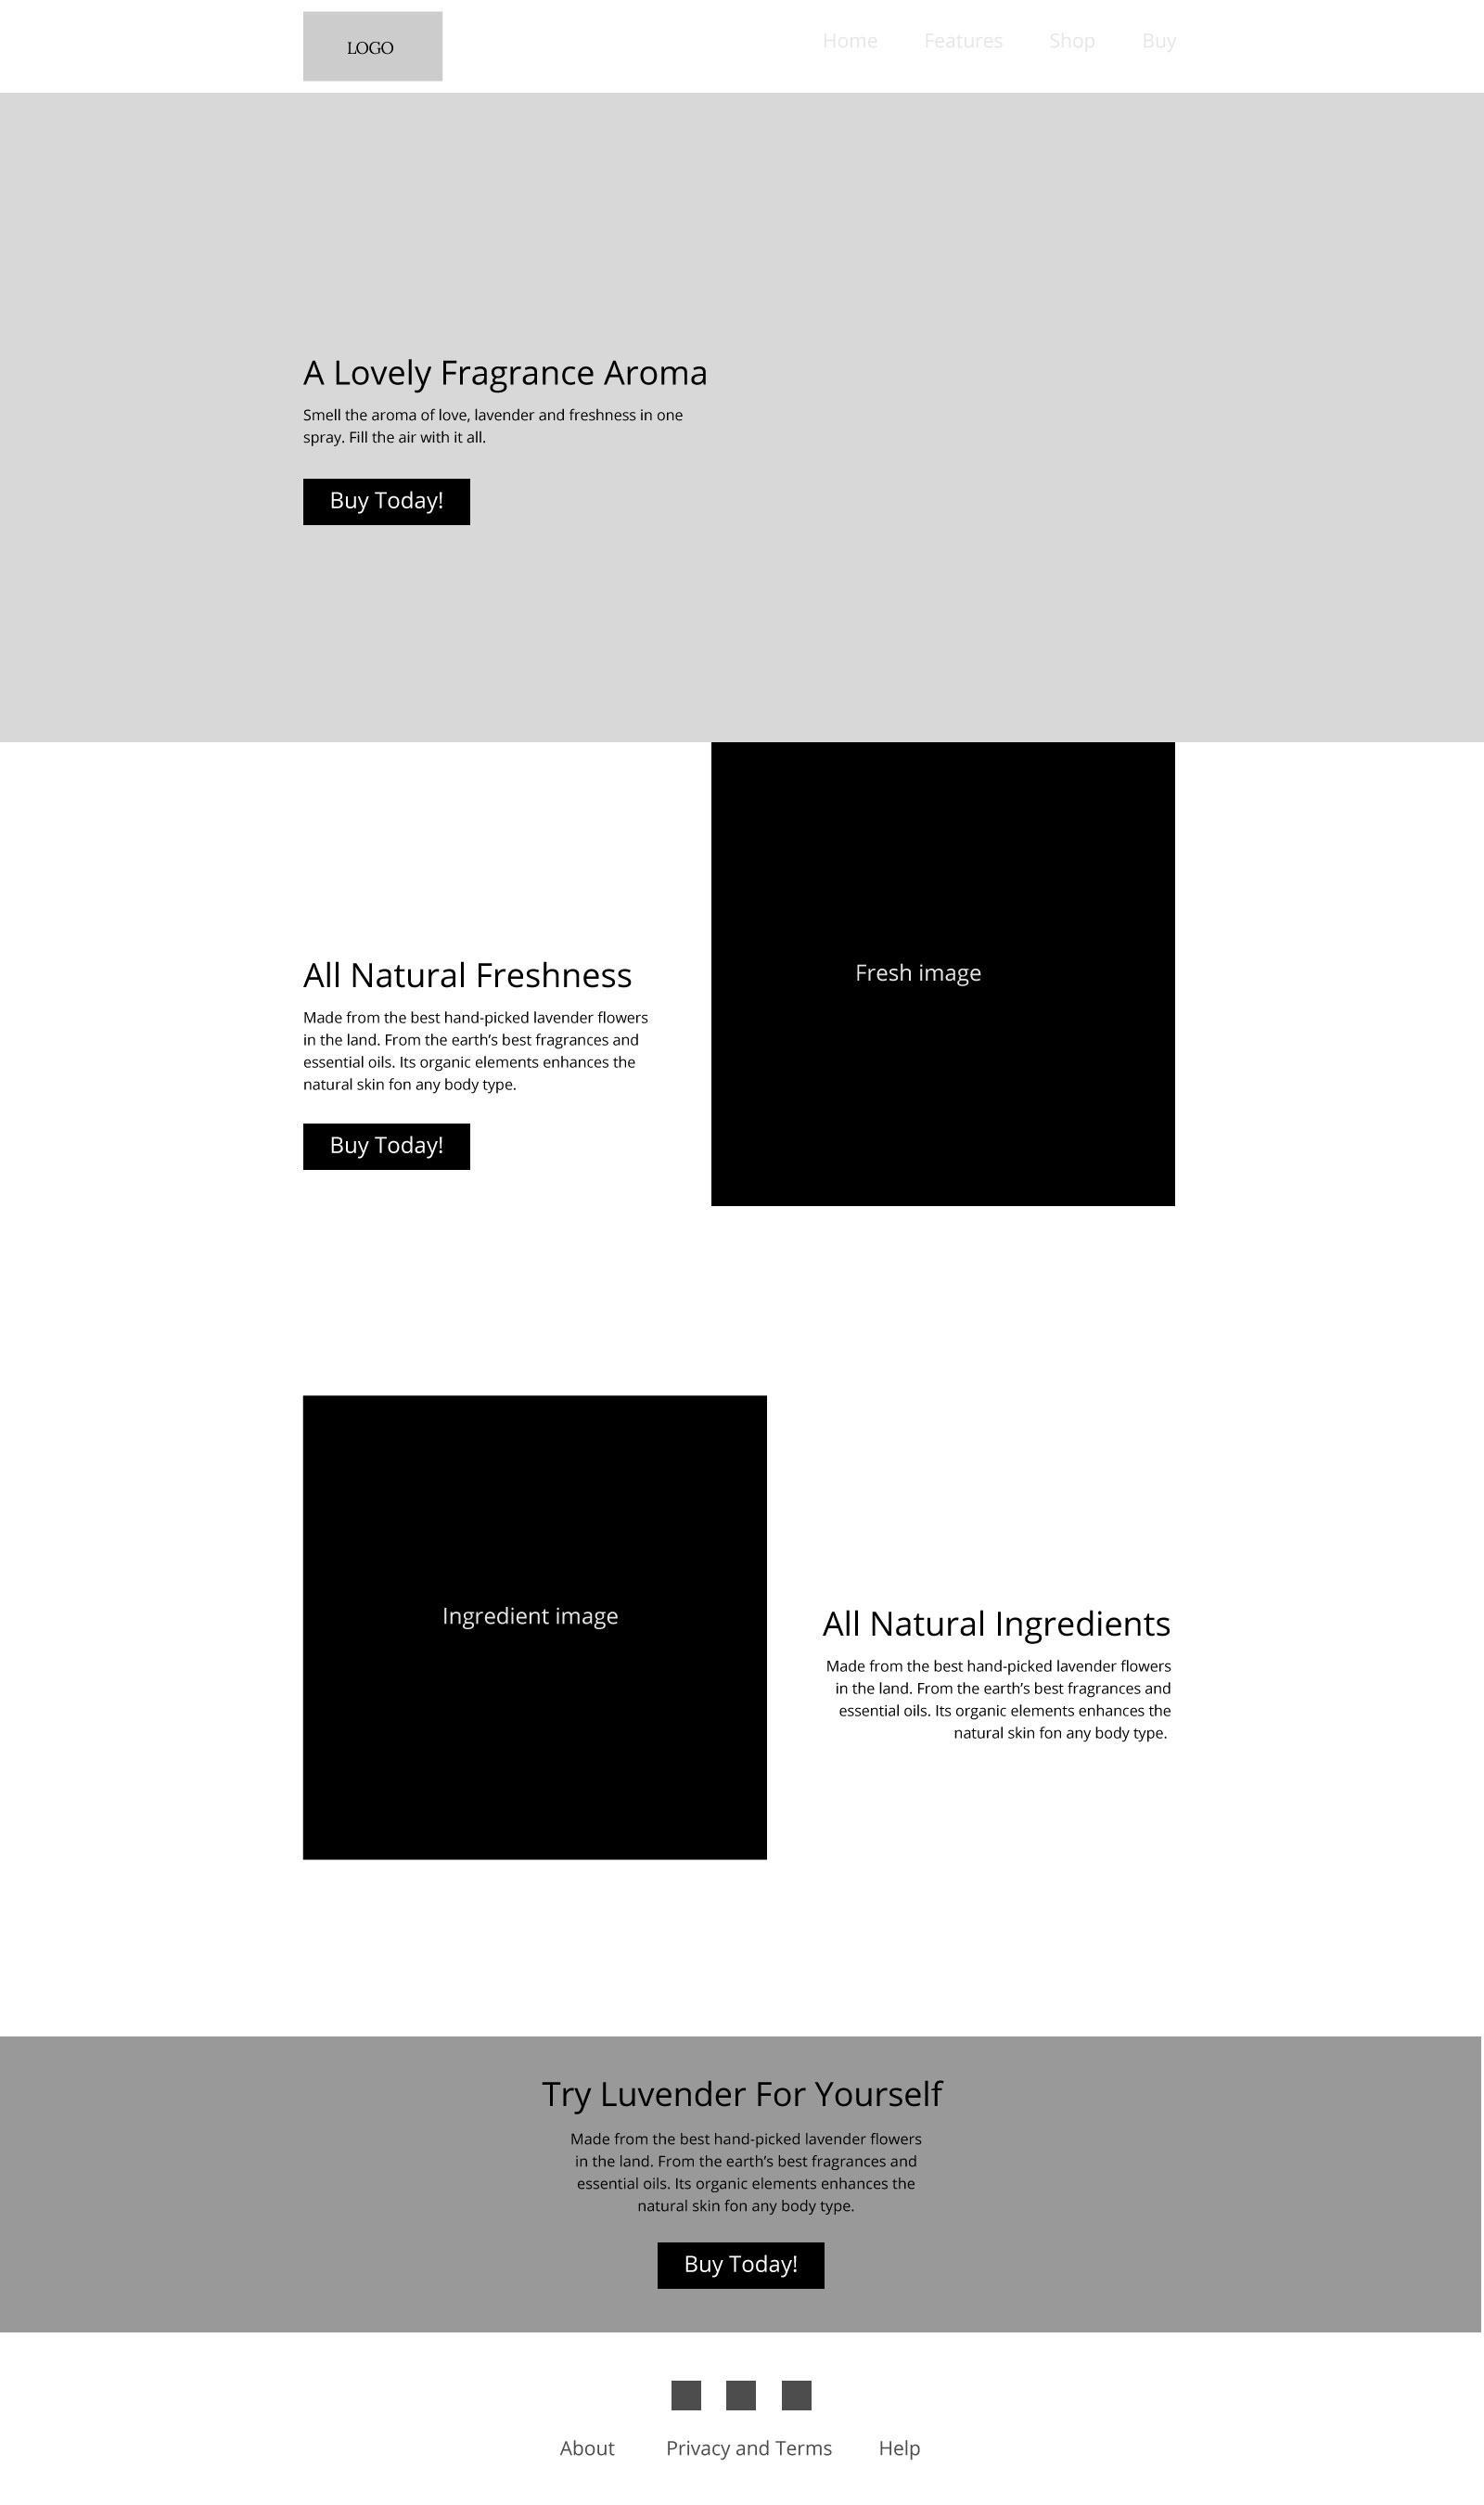 Luvendar - image 1 - student project